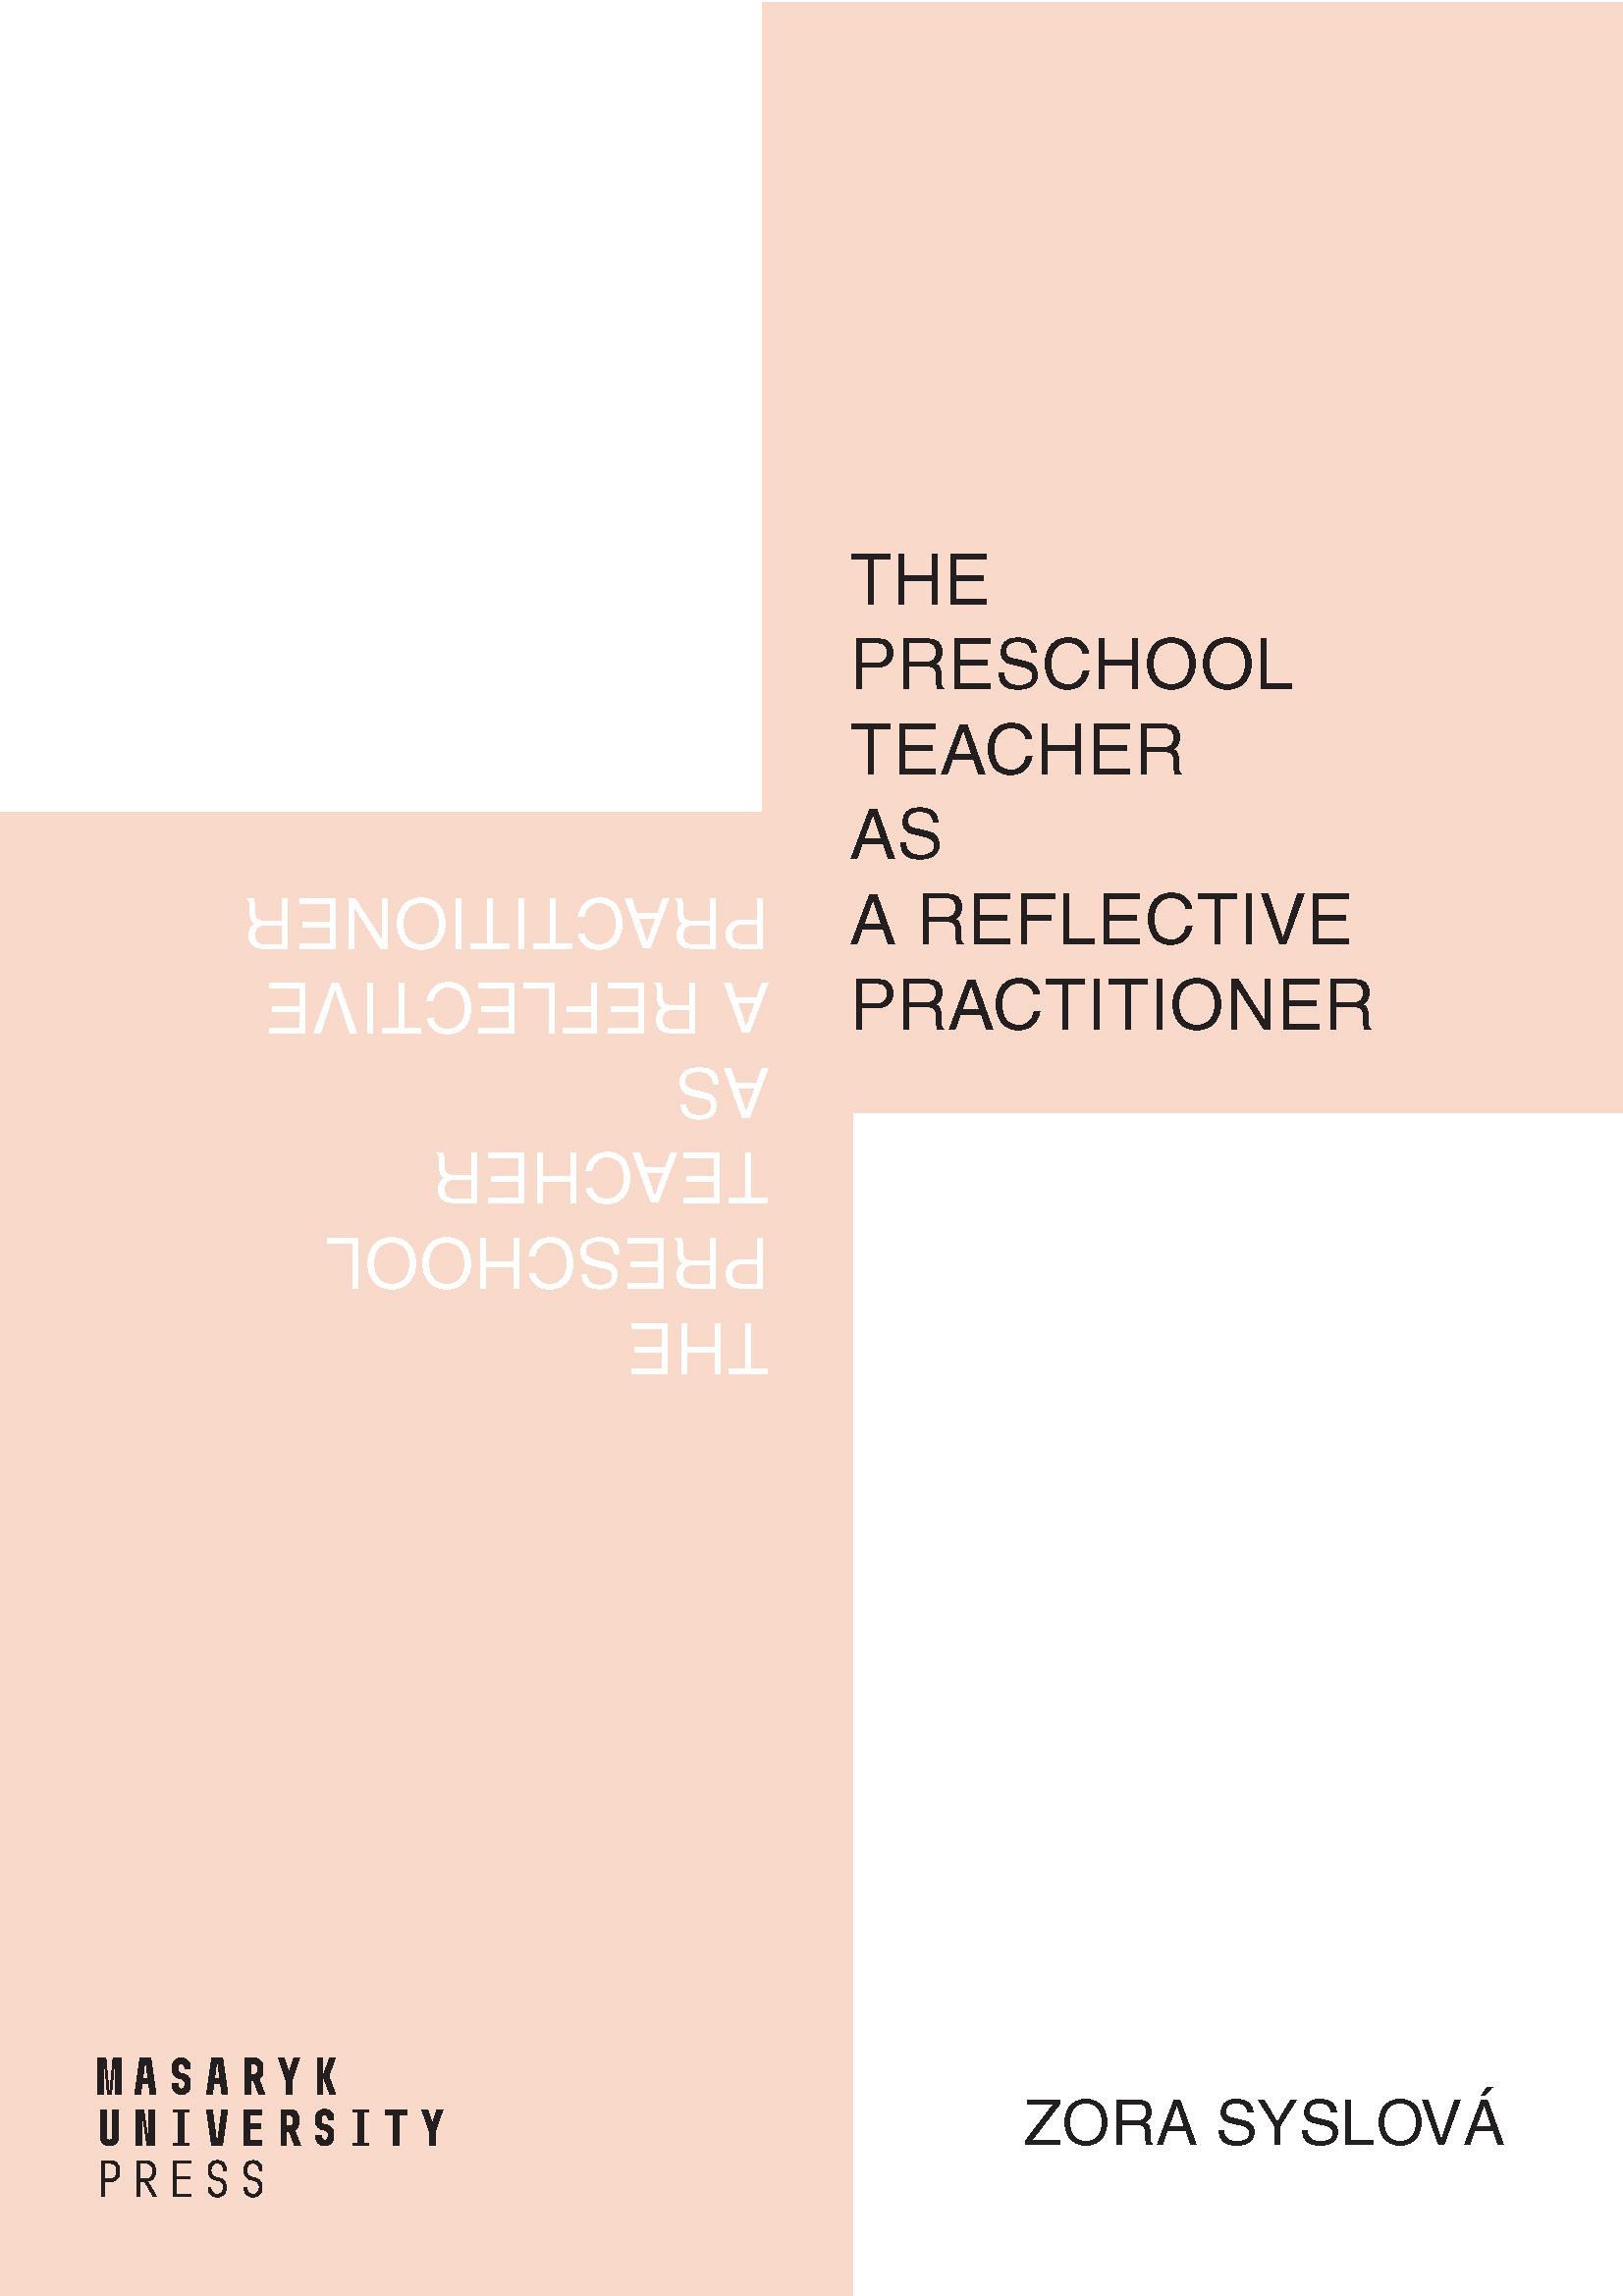 Obálka pro The preschool teacher as a reflective practitioner